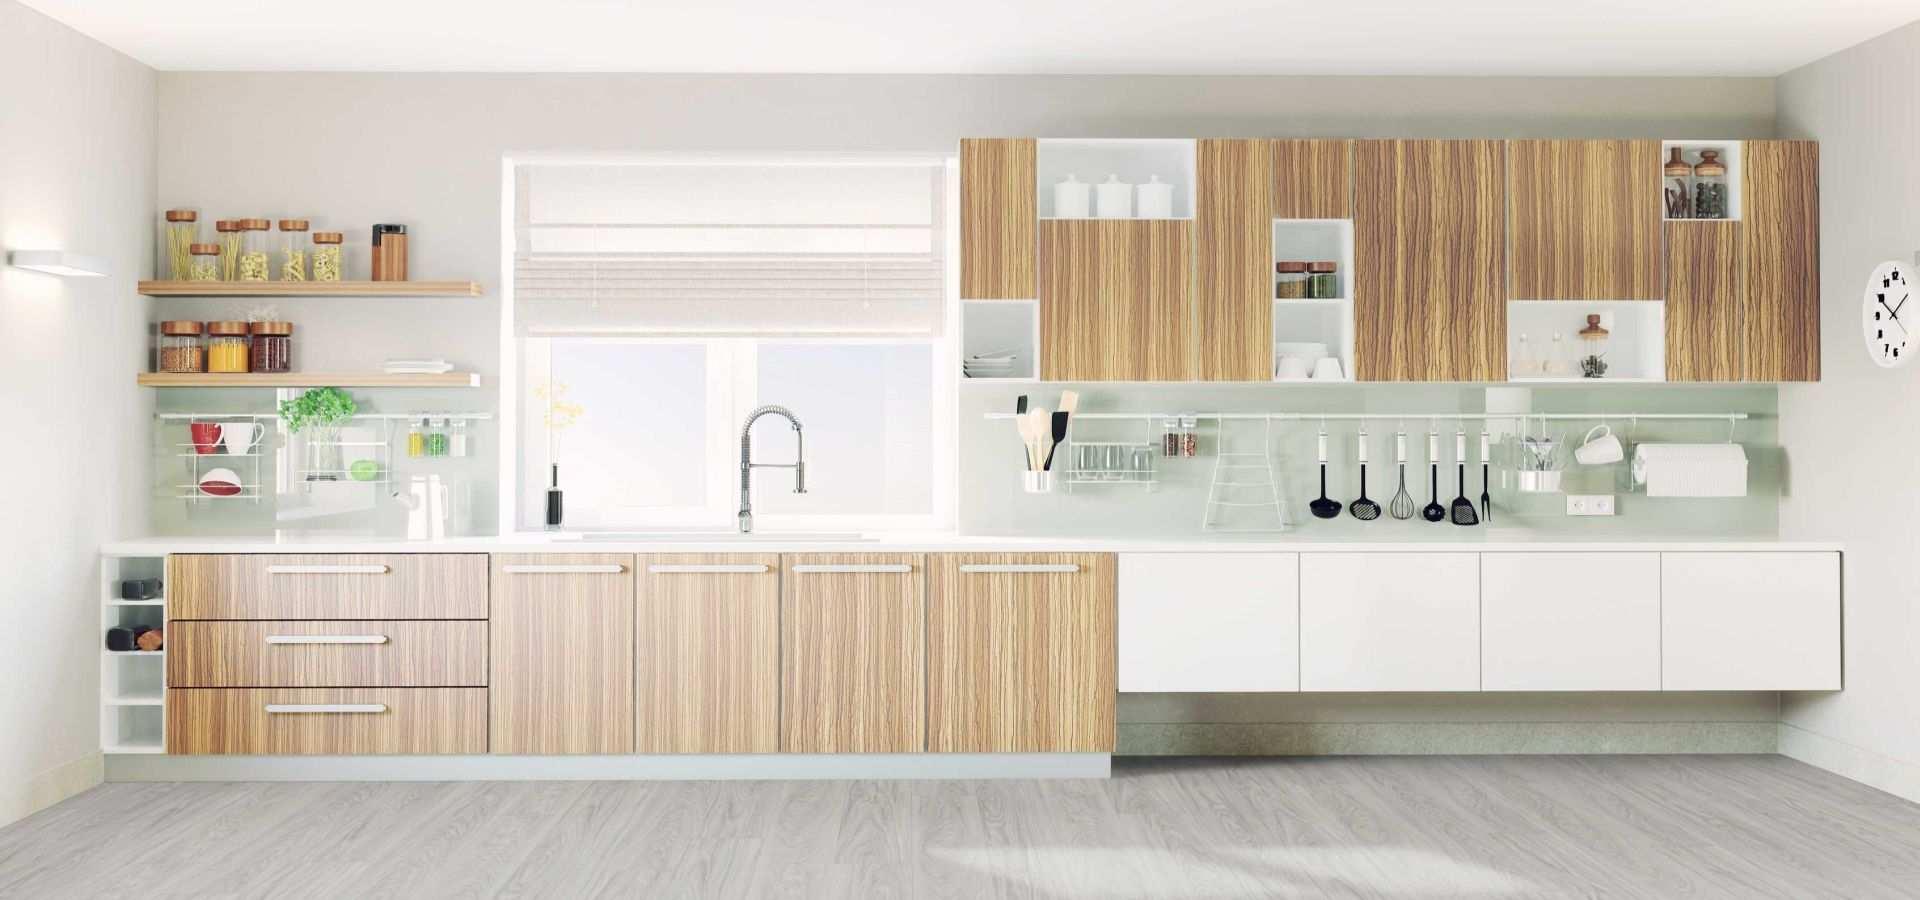 Bild Küche Vinylboden Holzoptik modern hell